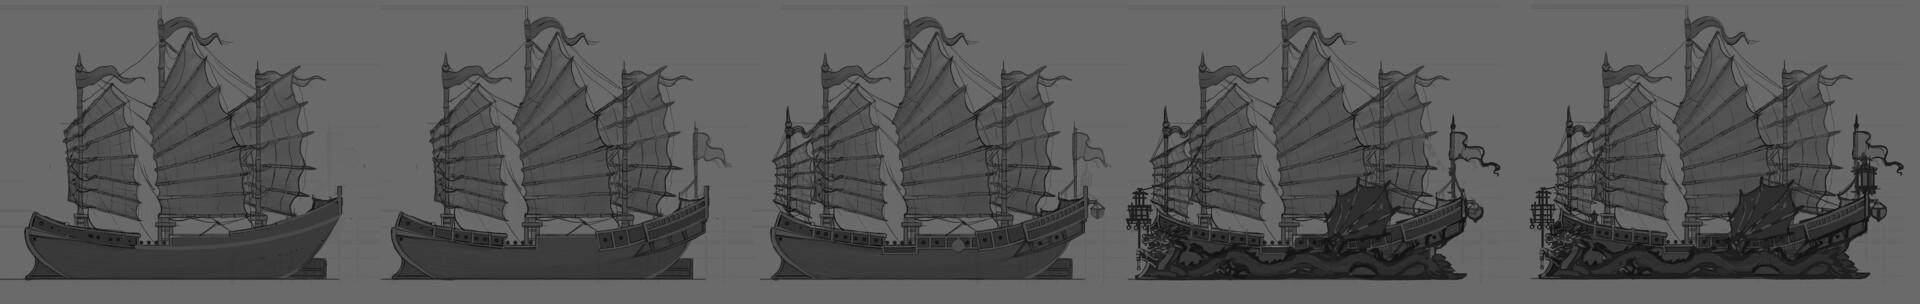 Chinese djonka ship